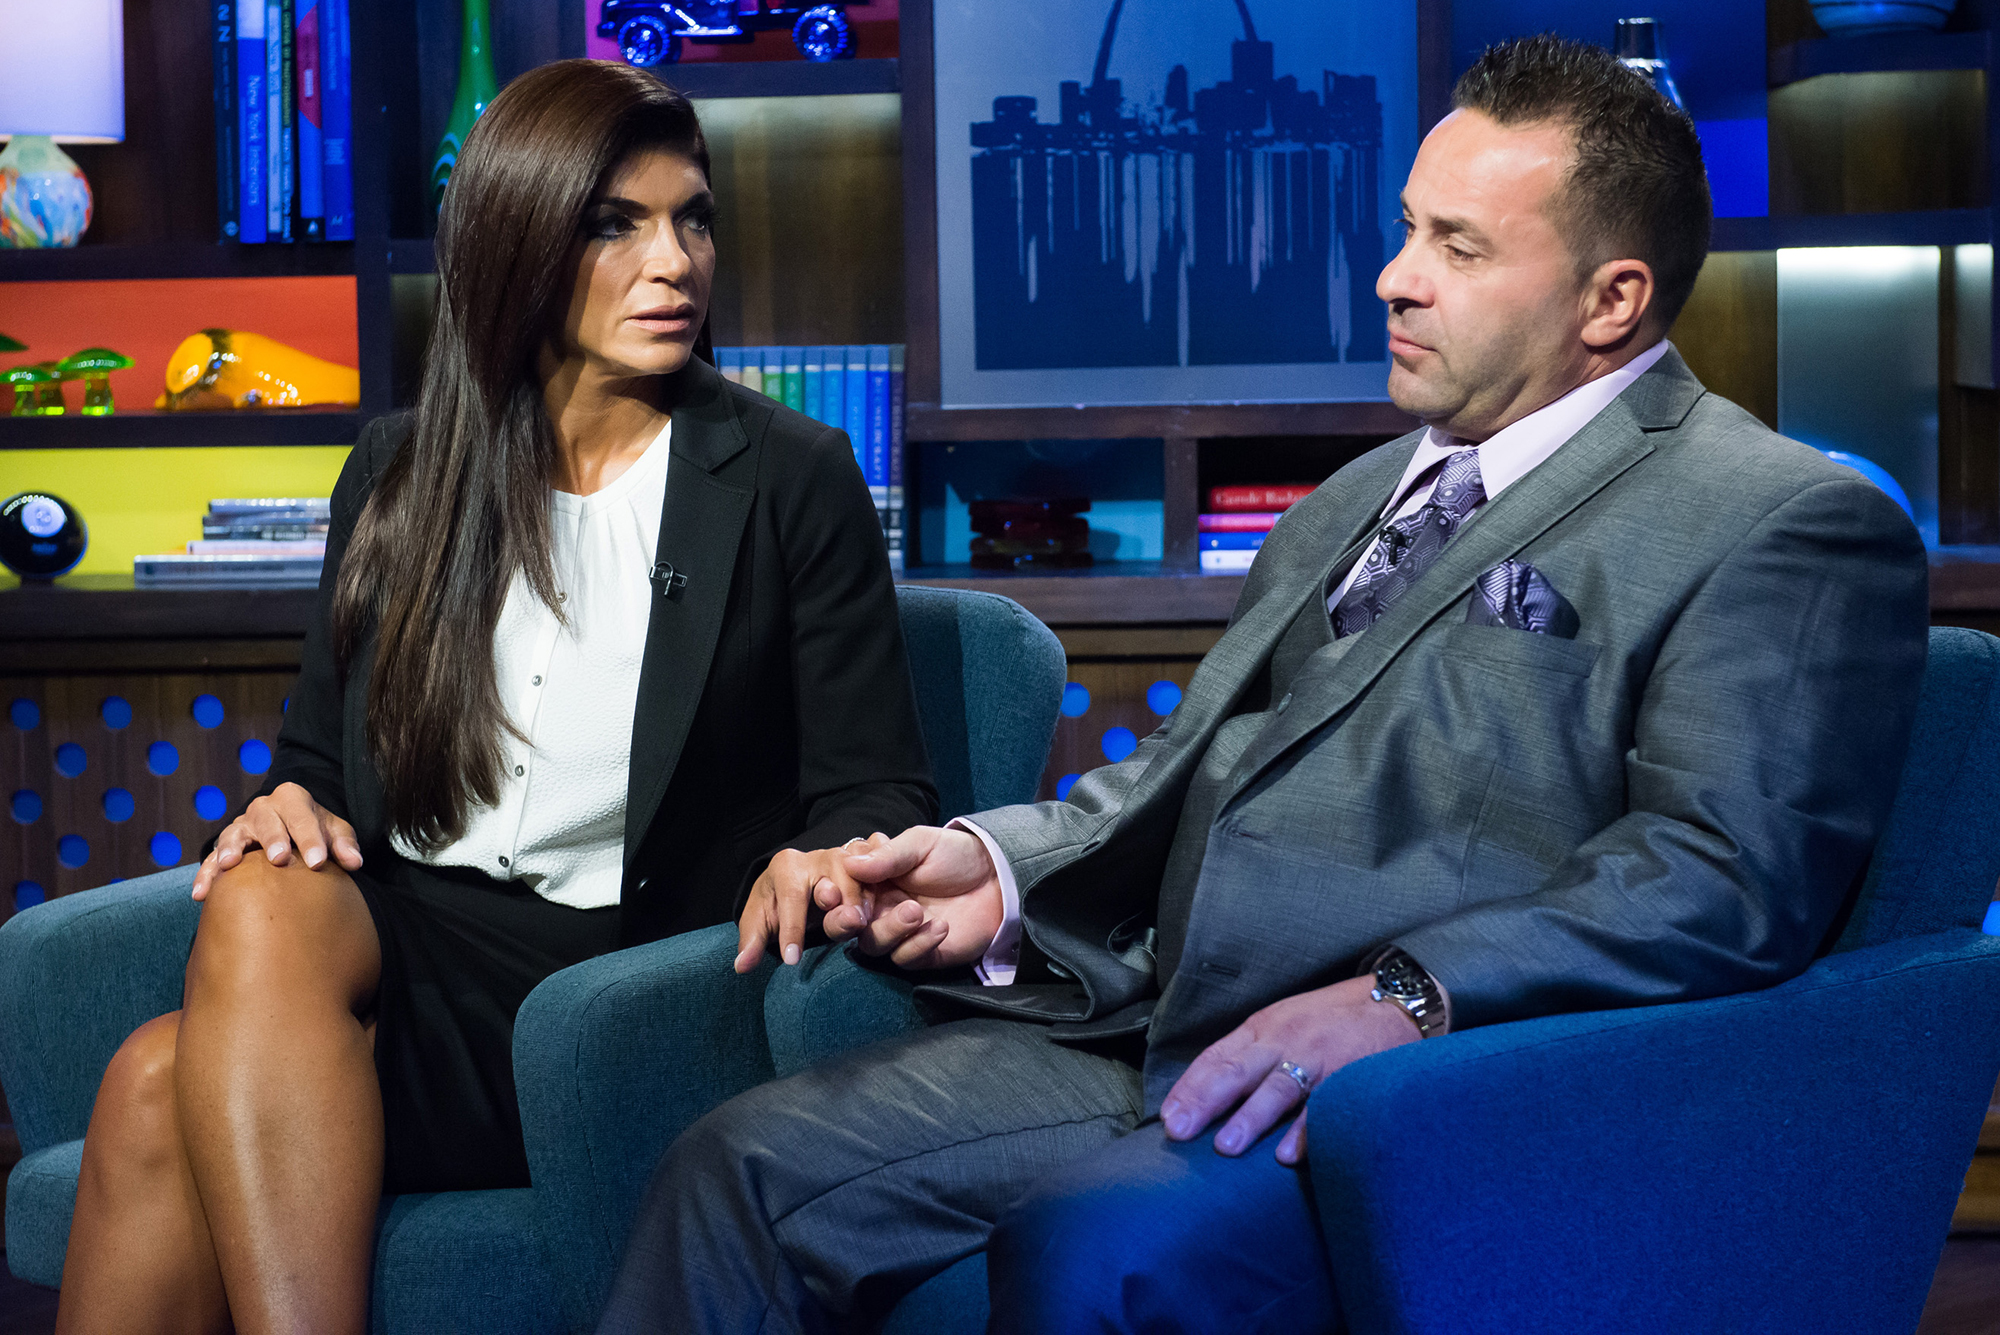 RHONJ Stars on Teresa Giudice Coping With Joe in Custody - Teresa Giudice and Joe Giudice.